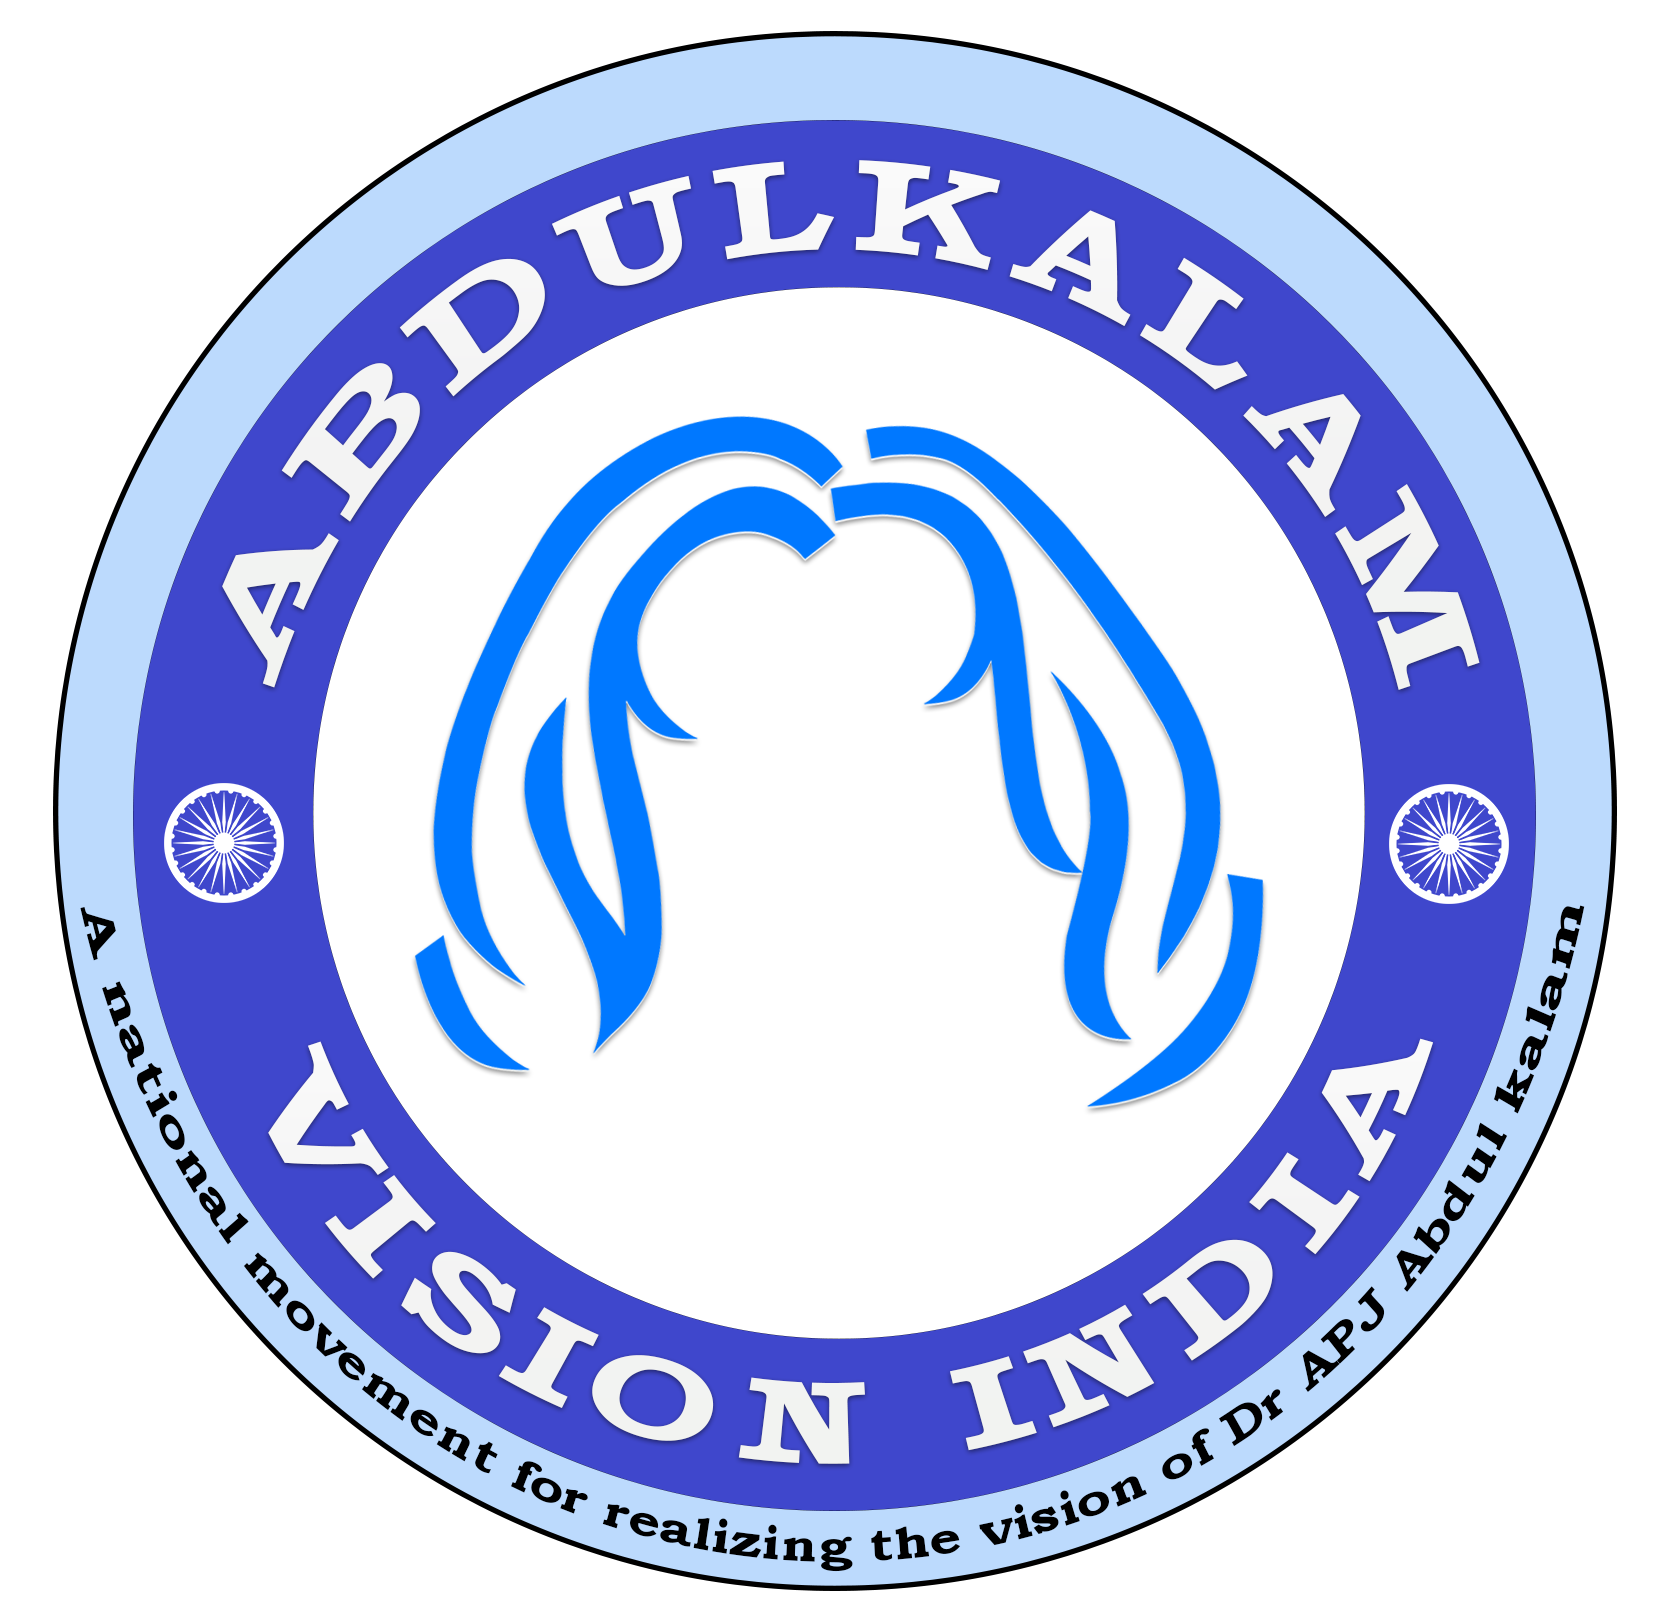 Abdukalam vision india logo for English India logo